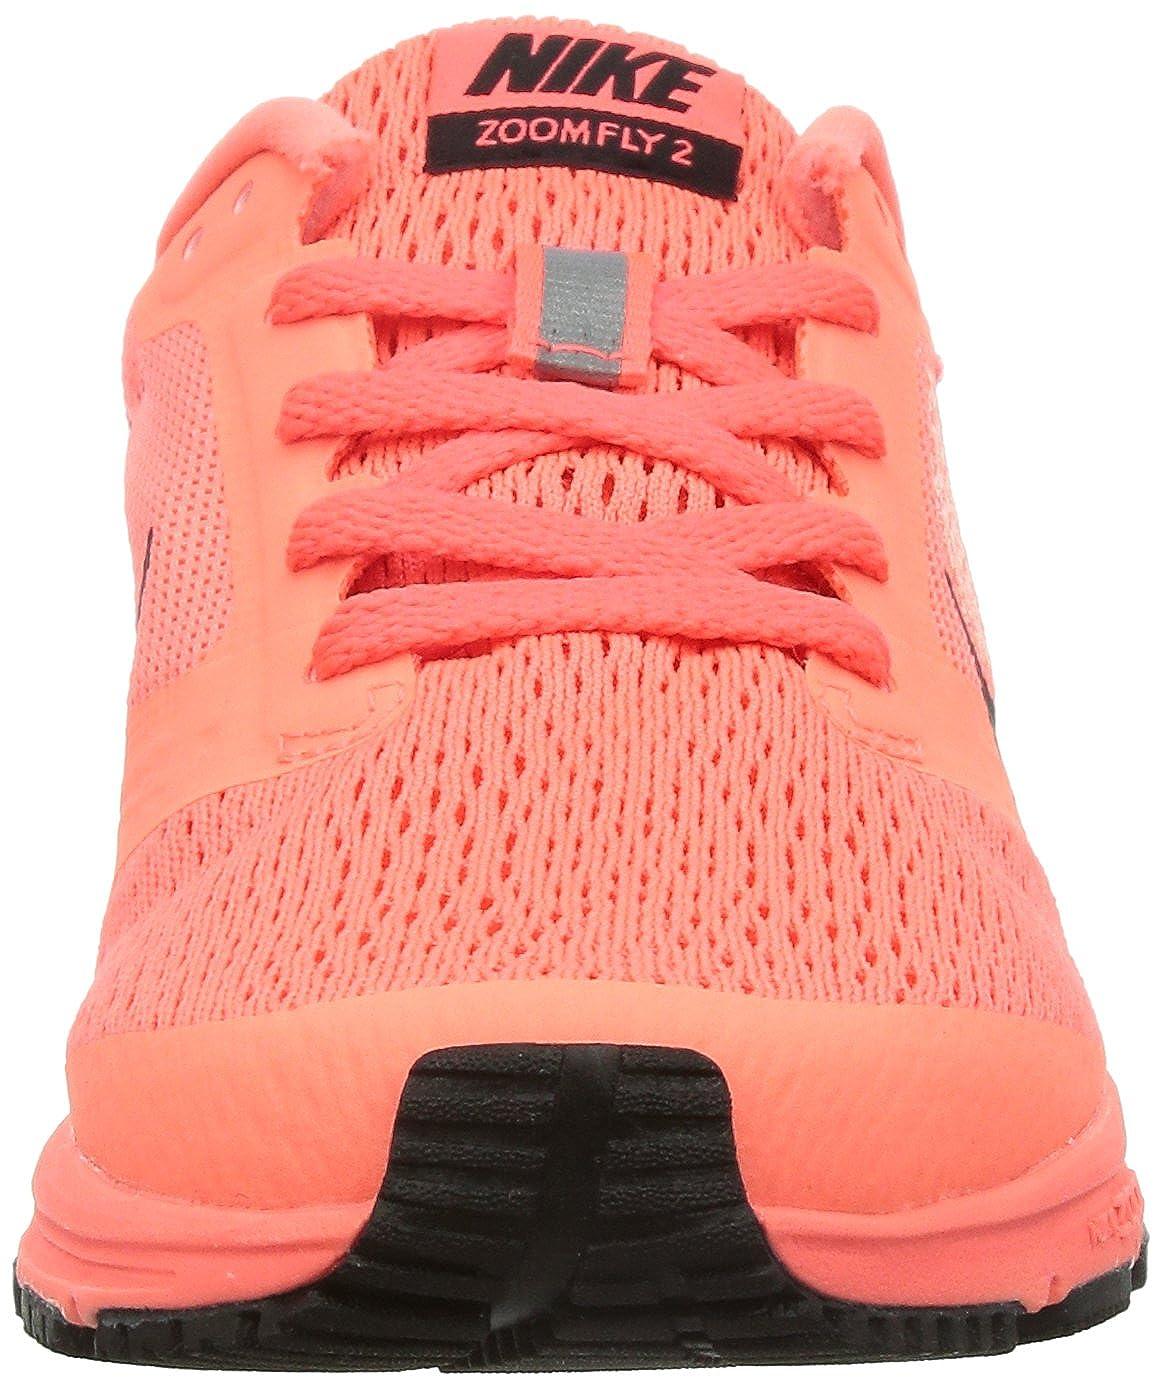 46687a8ee9d Nike - Air Zoom Fly 2 Women s Running Shoes (Orange) - EU 39 - US 8   Amazon.co.uk  Shoes   Bags